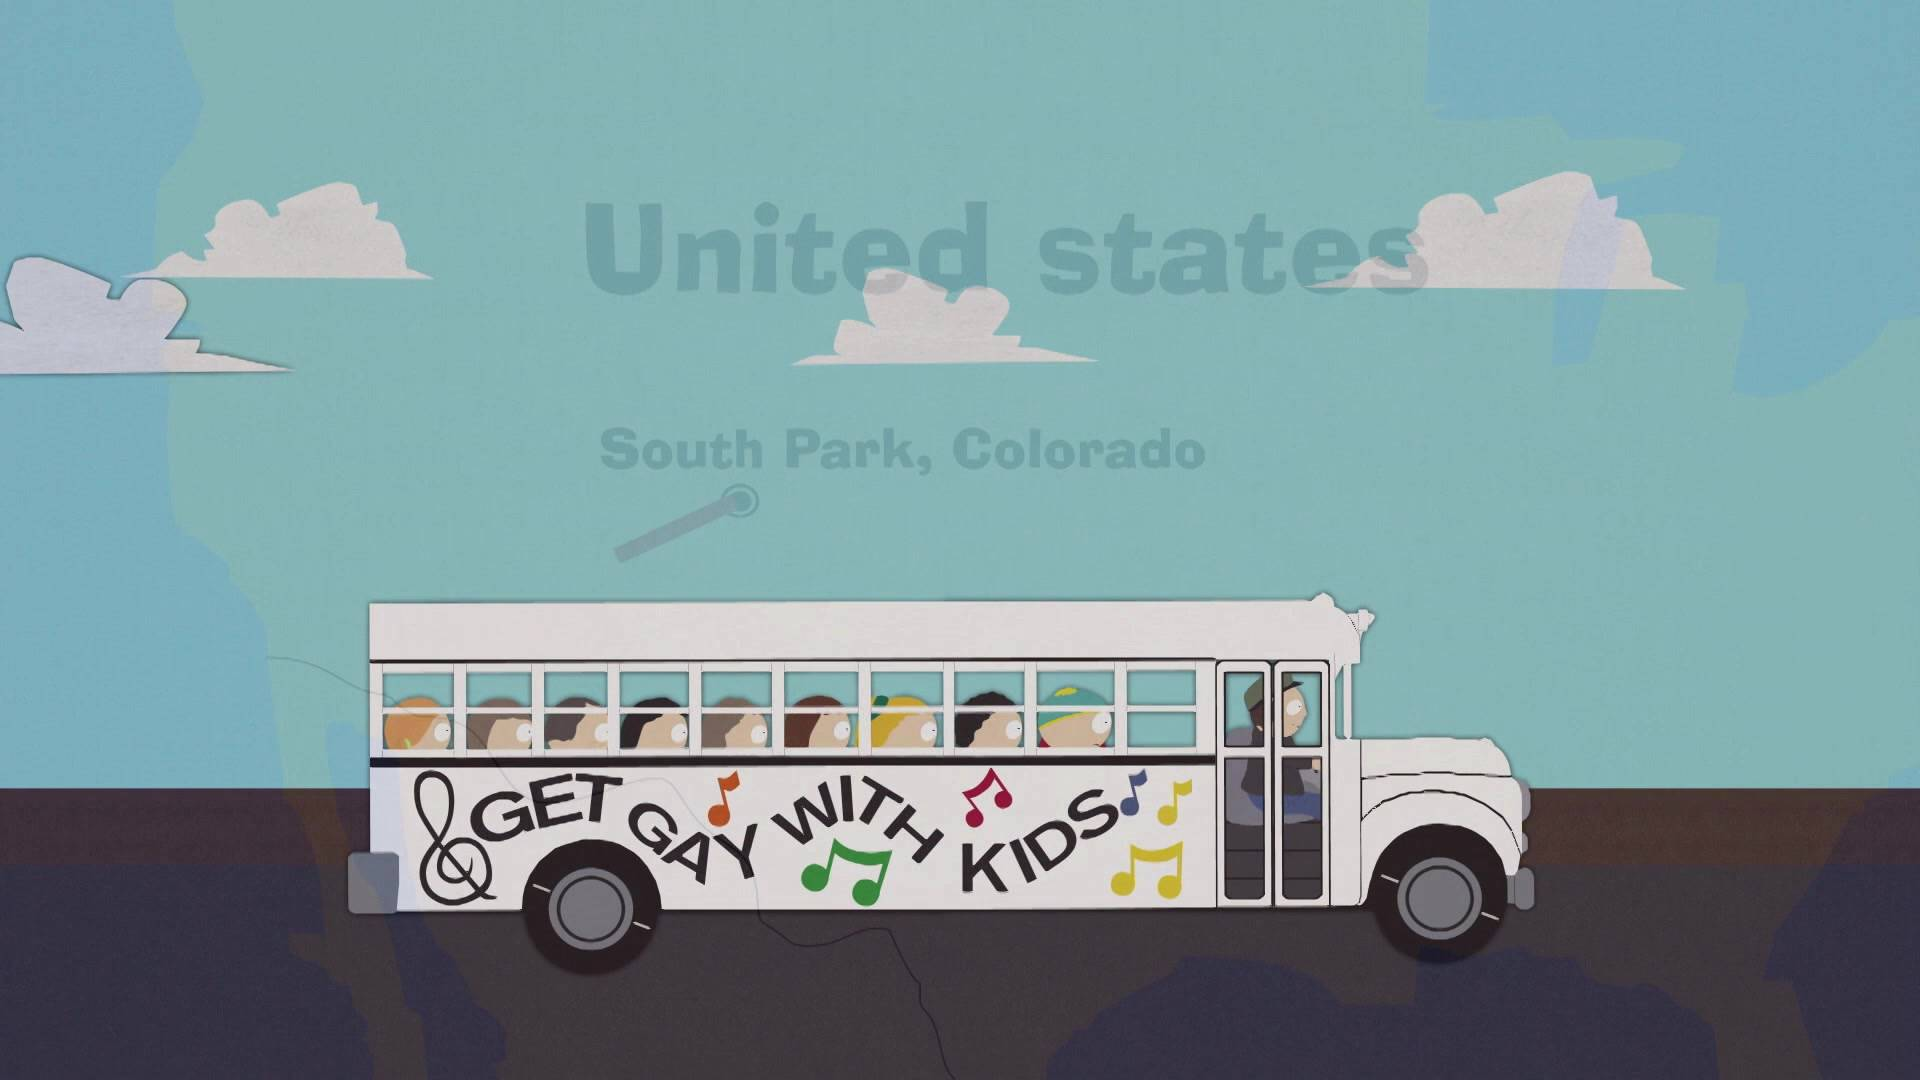 гифка автобус едет по земле картинки